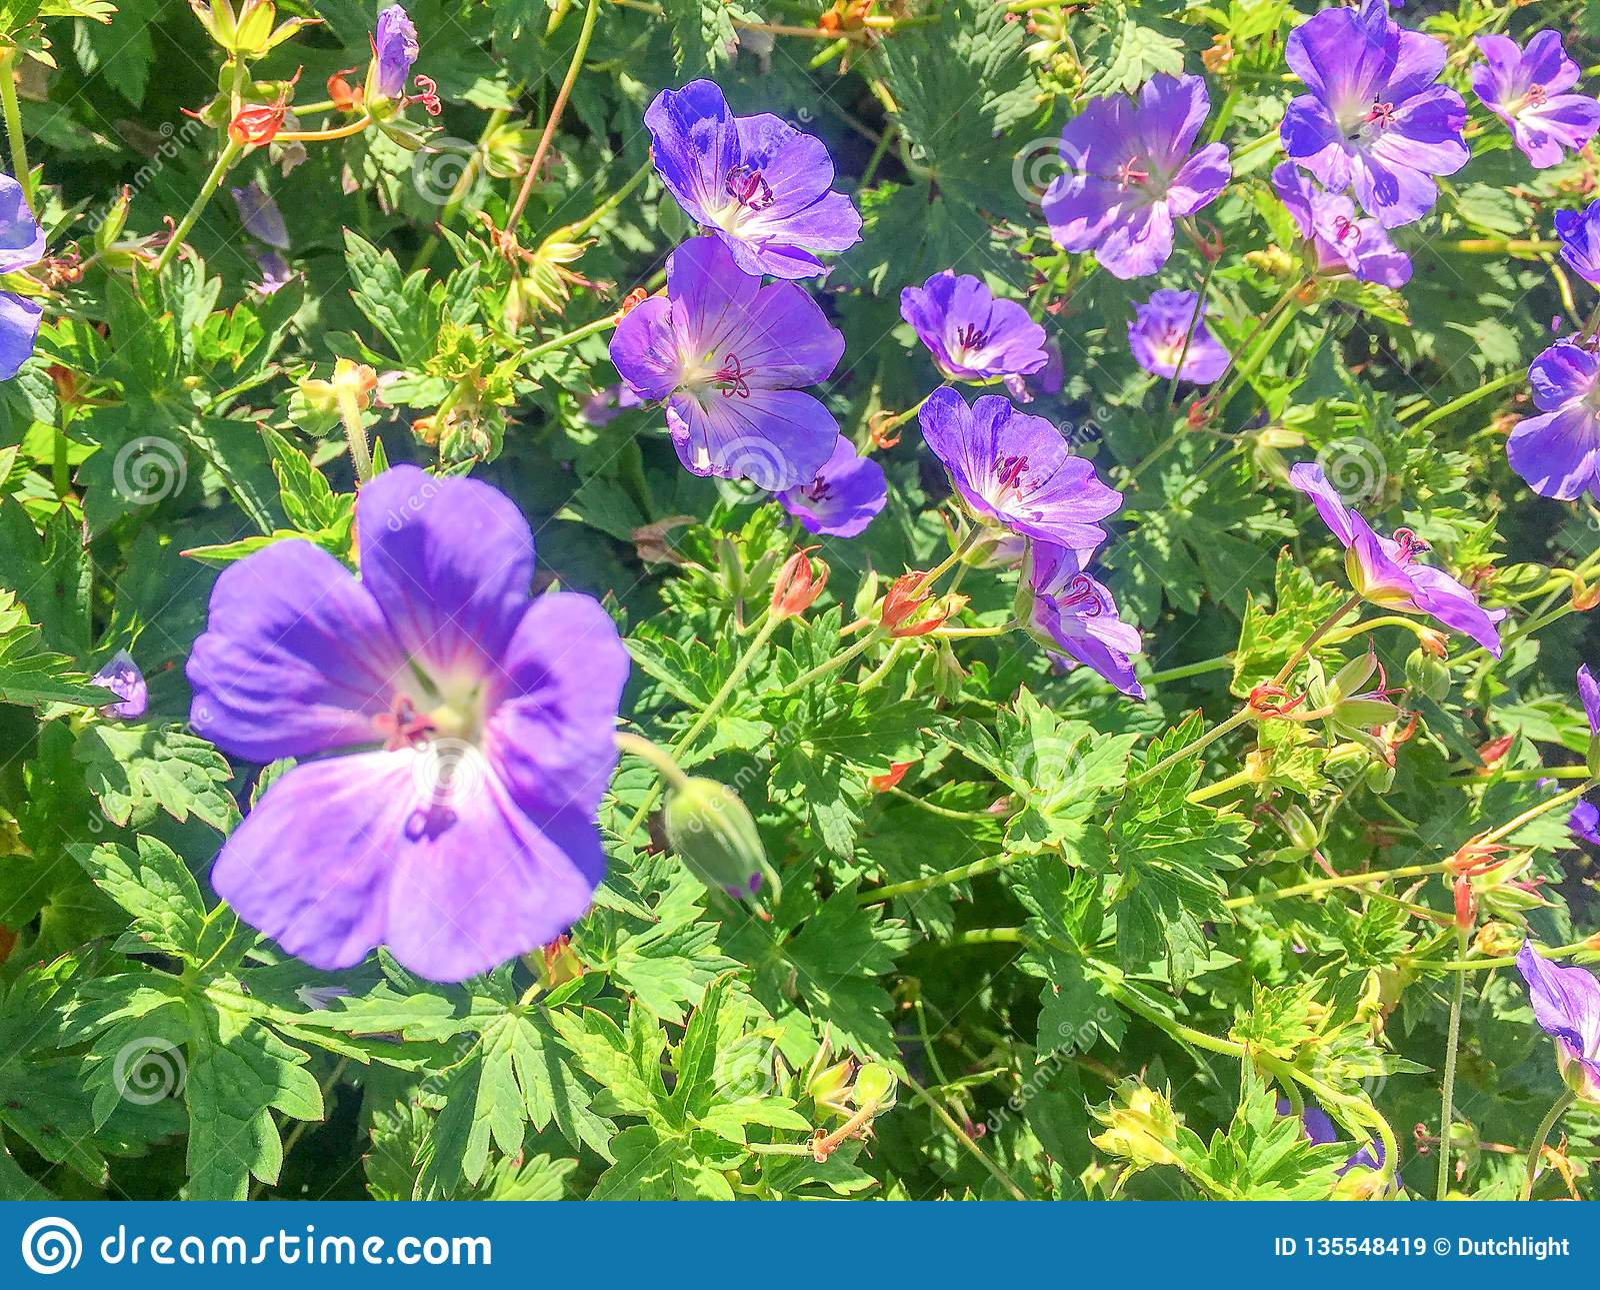 Geranium Rosanne plants flowering in close-up.